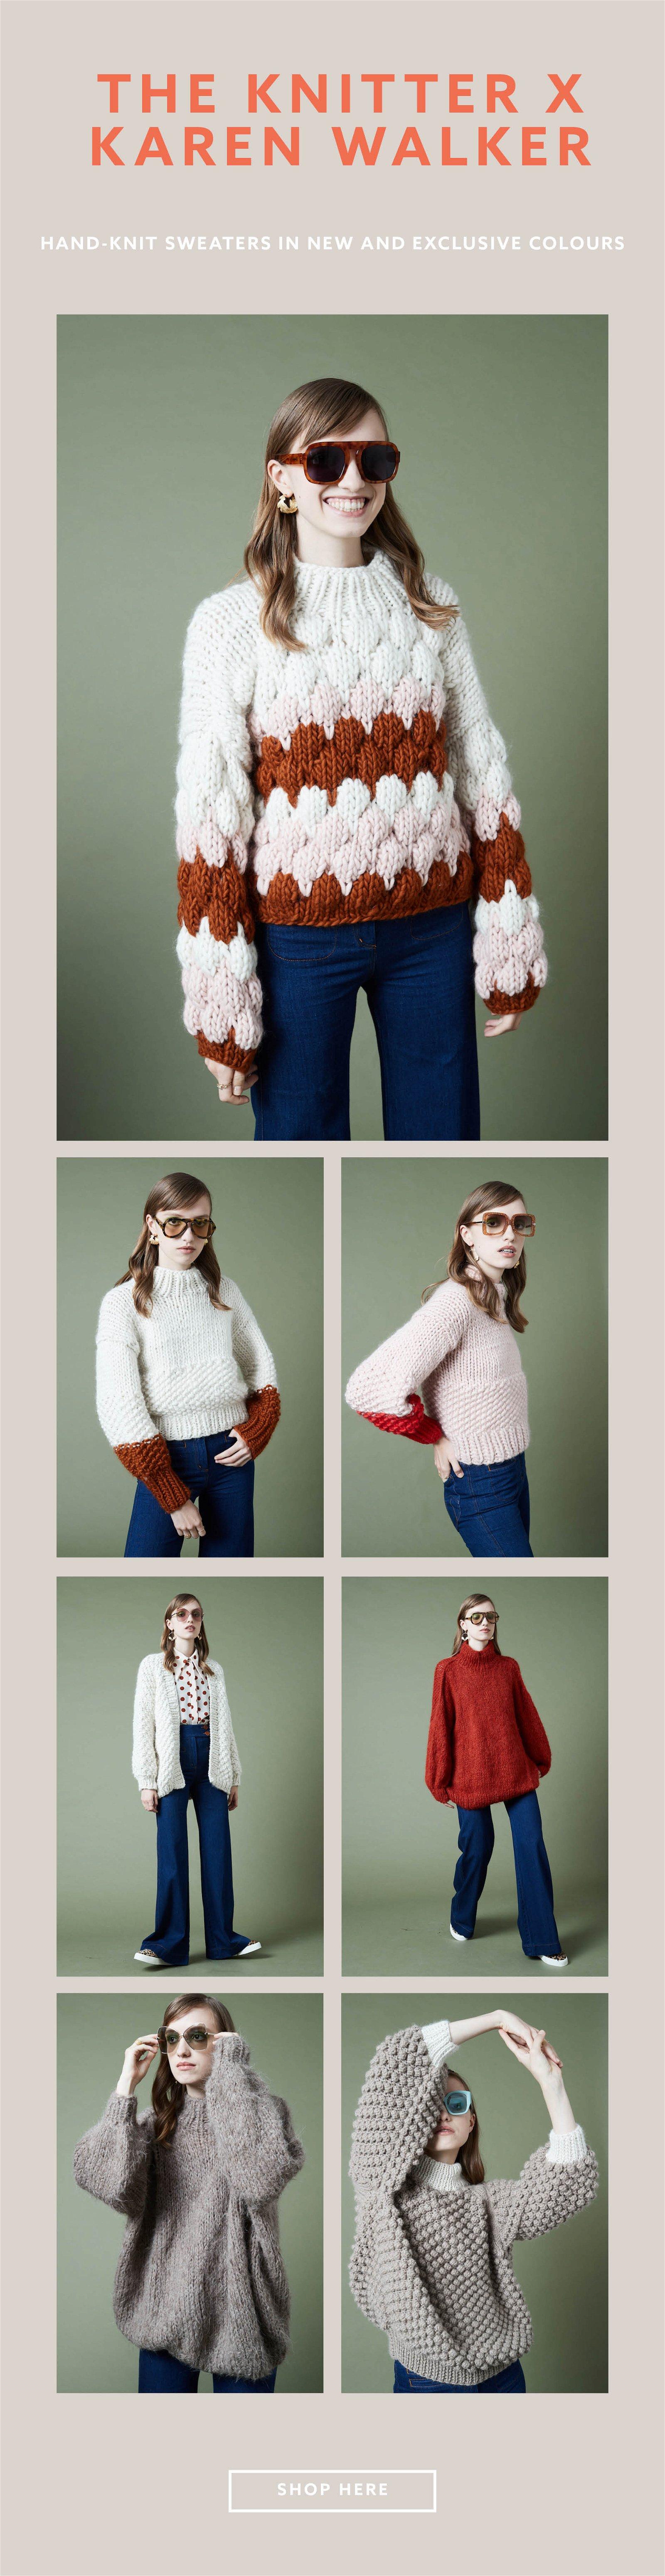 The Knitter x Karen Walker